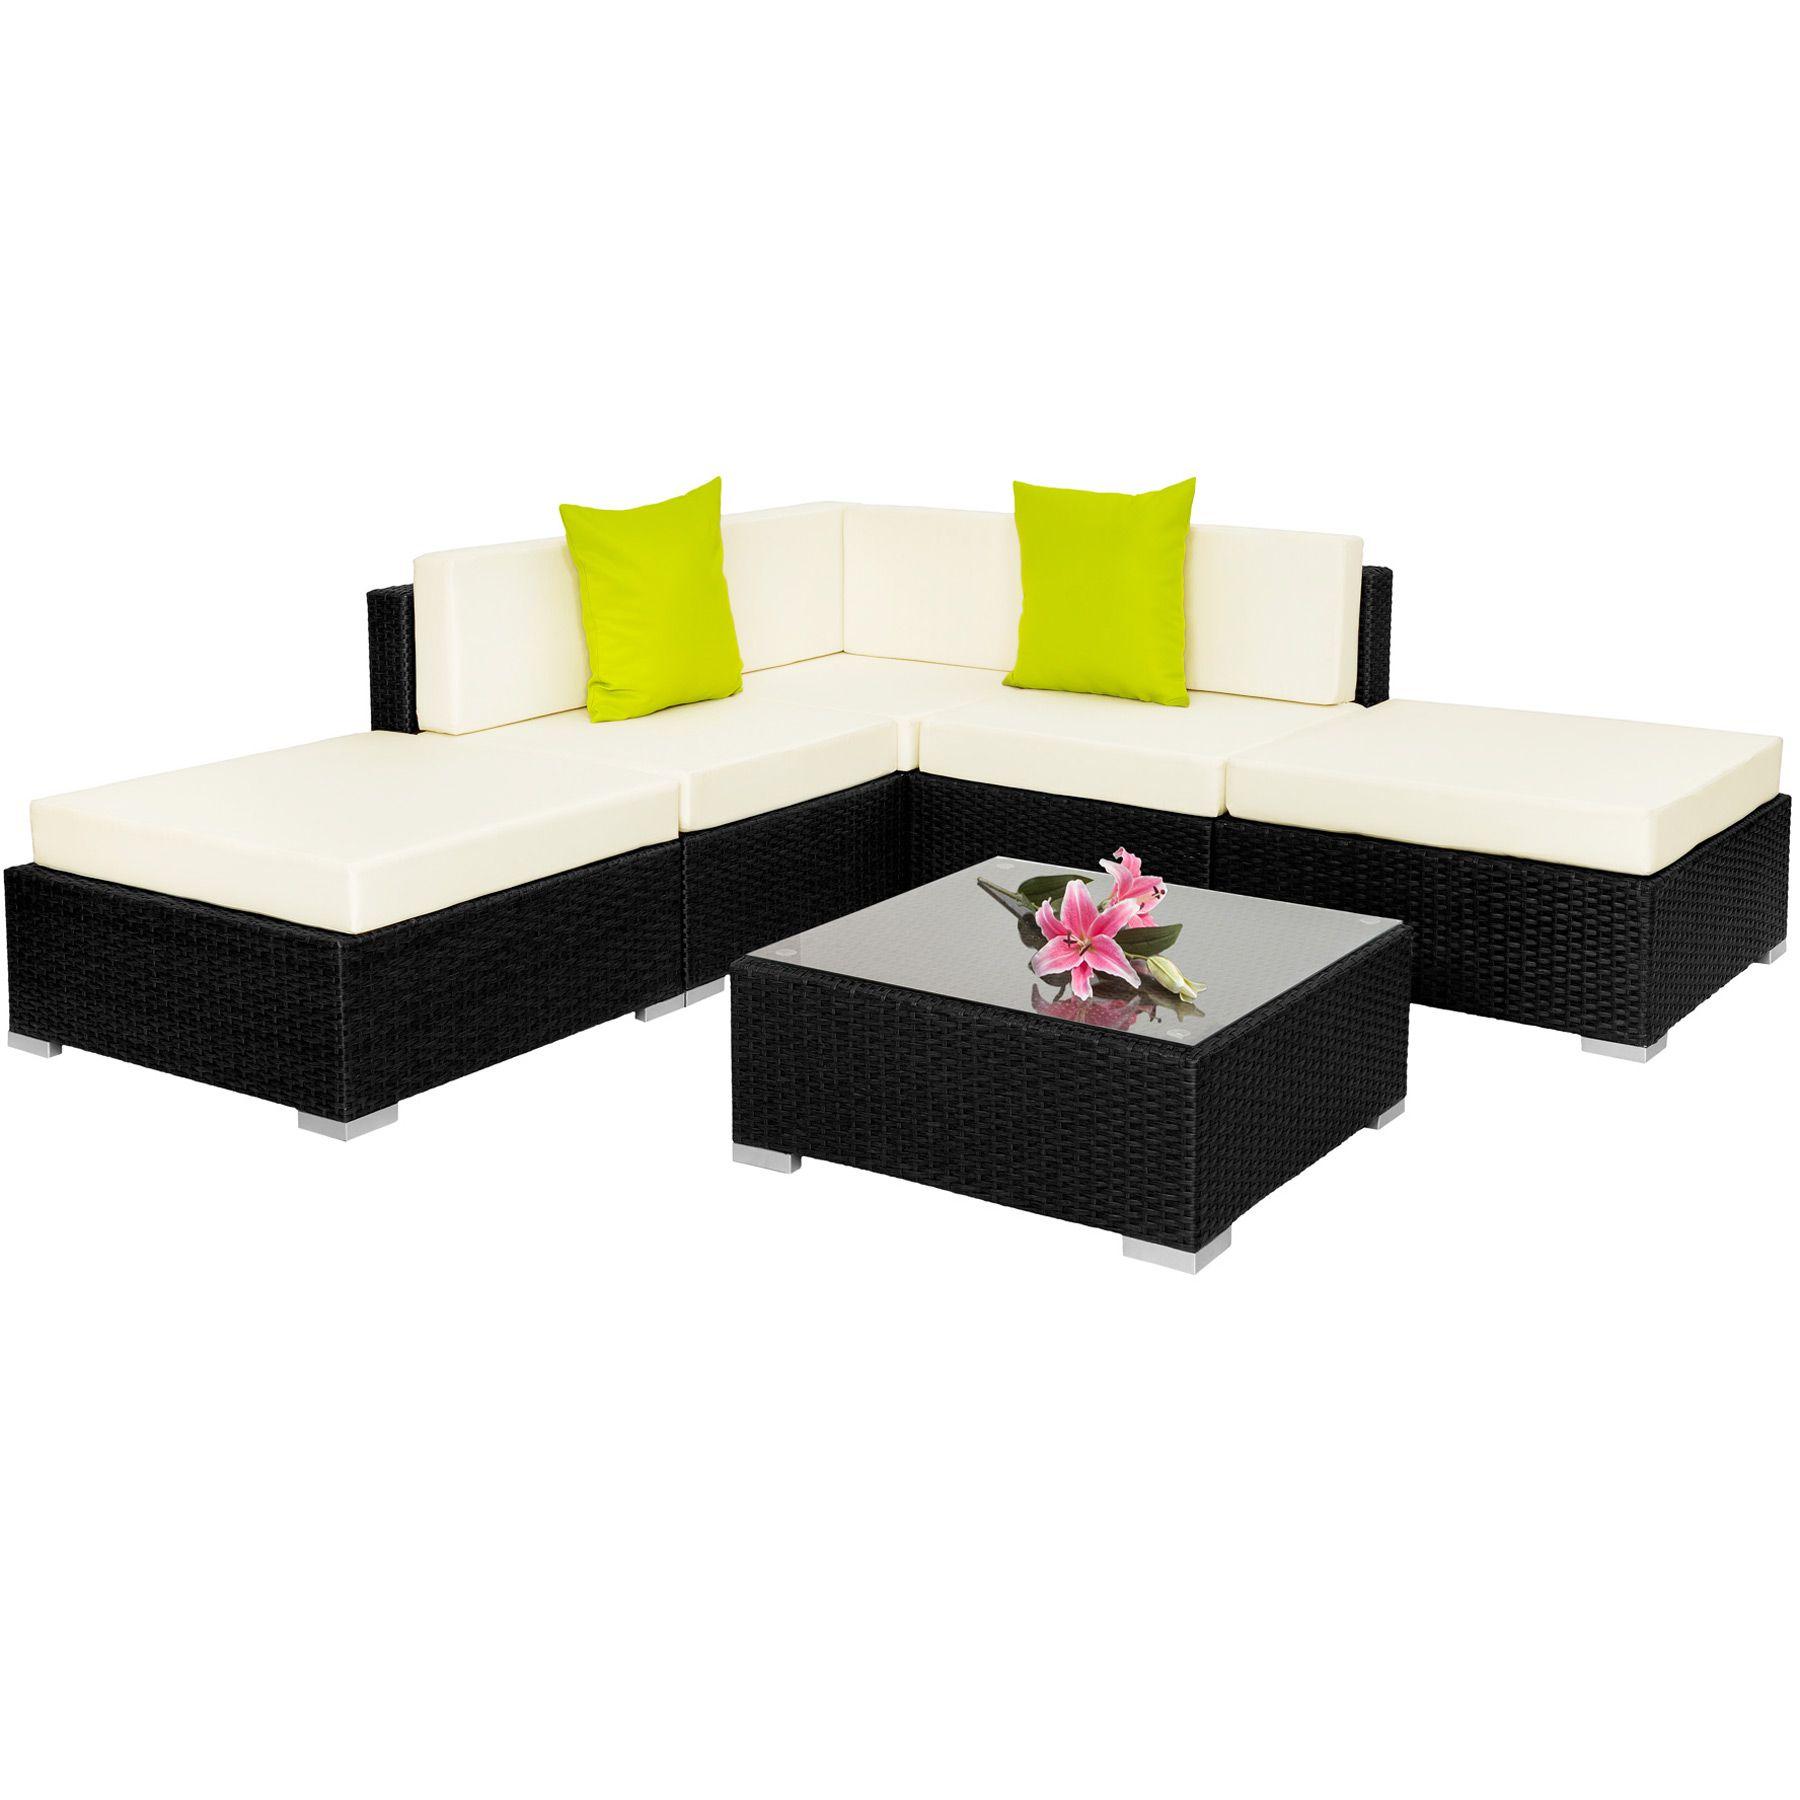 Alu Poly Rattan Sitzgruppe Lounge Rattanmöbel Gartenmöbel Couch ...